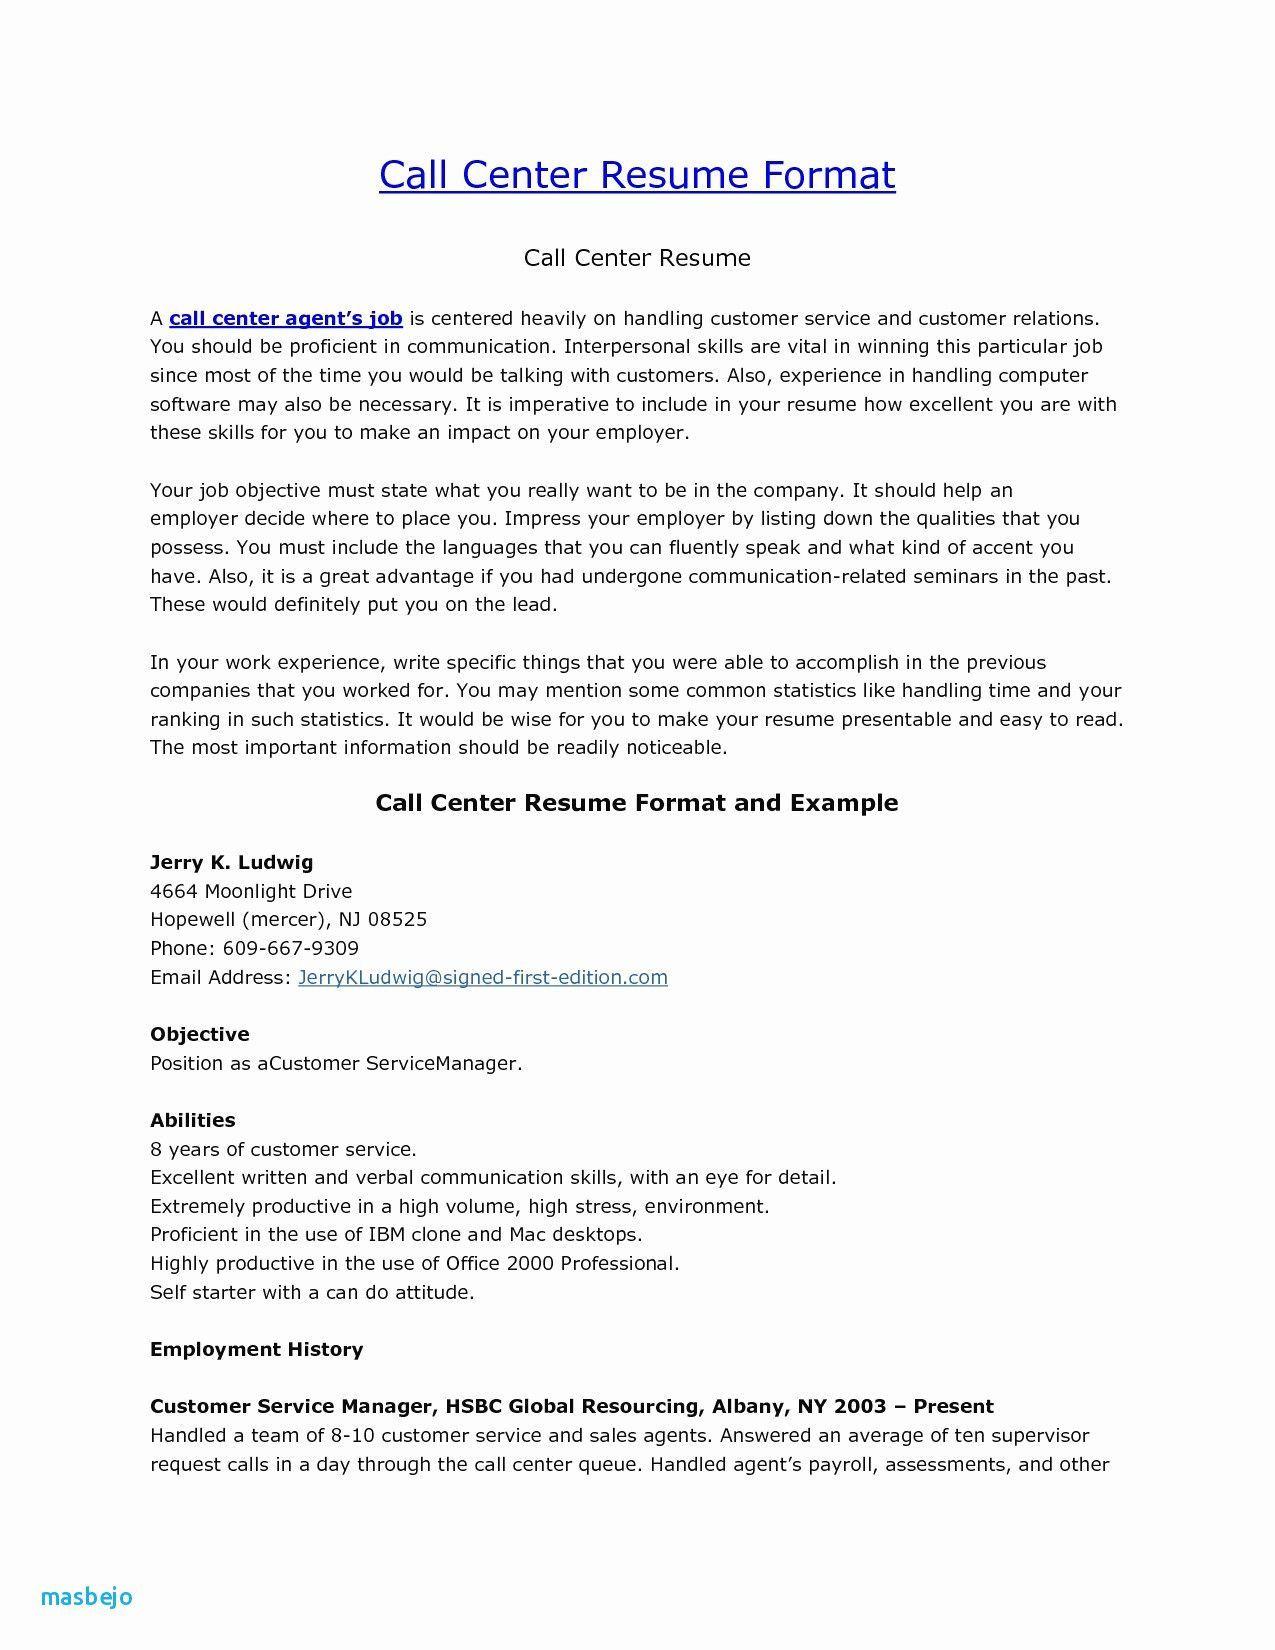 30 Call Center Customer Service Resume In 2020 Resume Skills